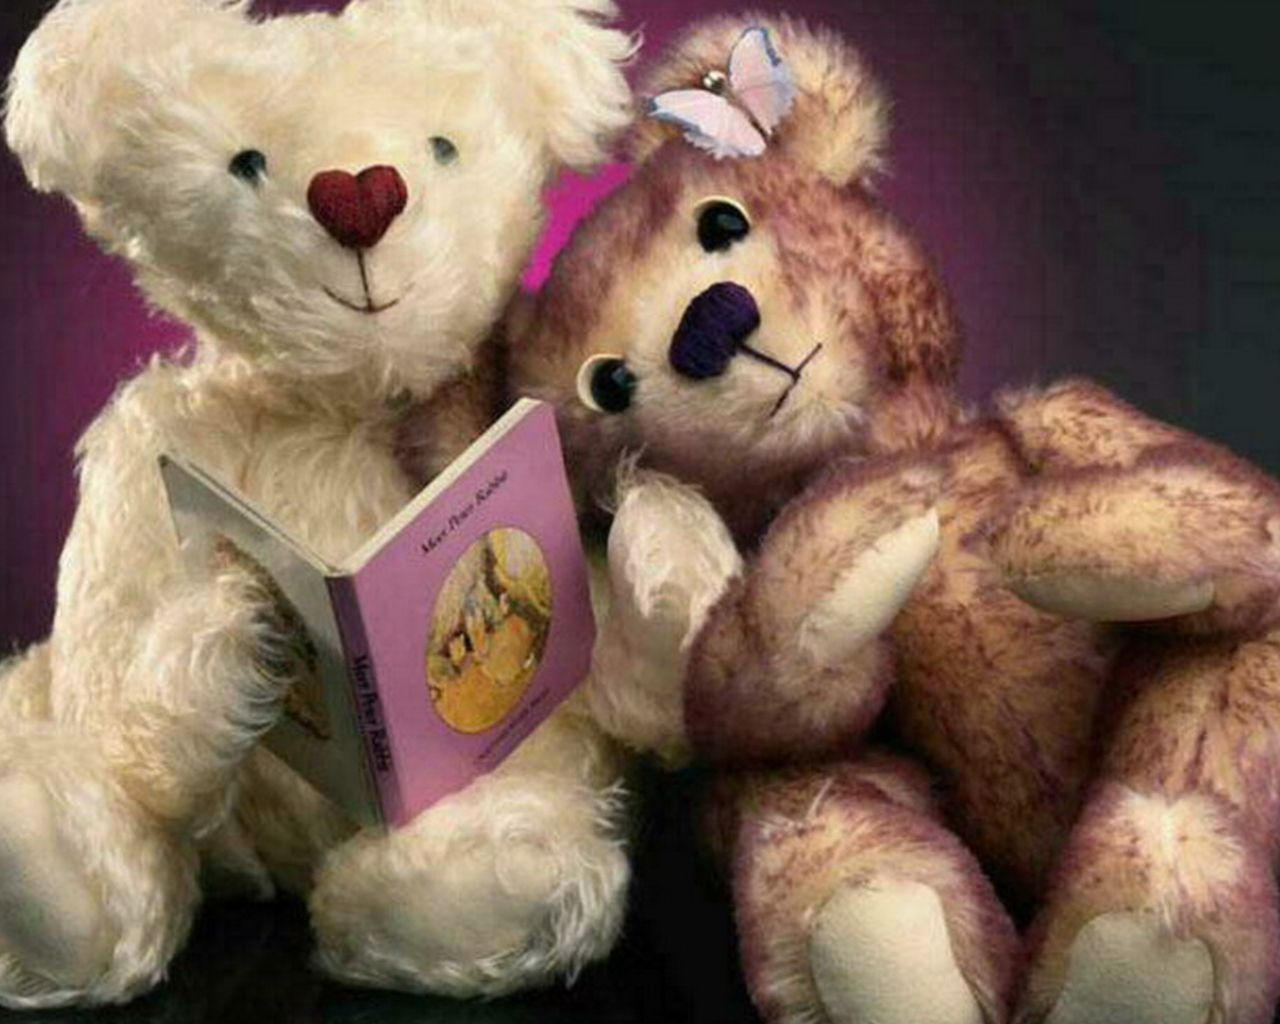 Love Teddy Bear Wallpaper 27 Free Download 1280x1024 Pixel In Others